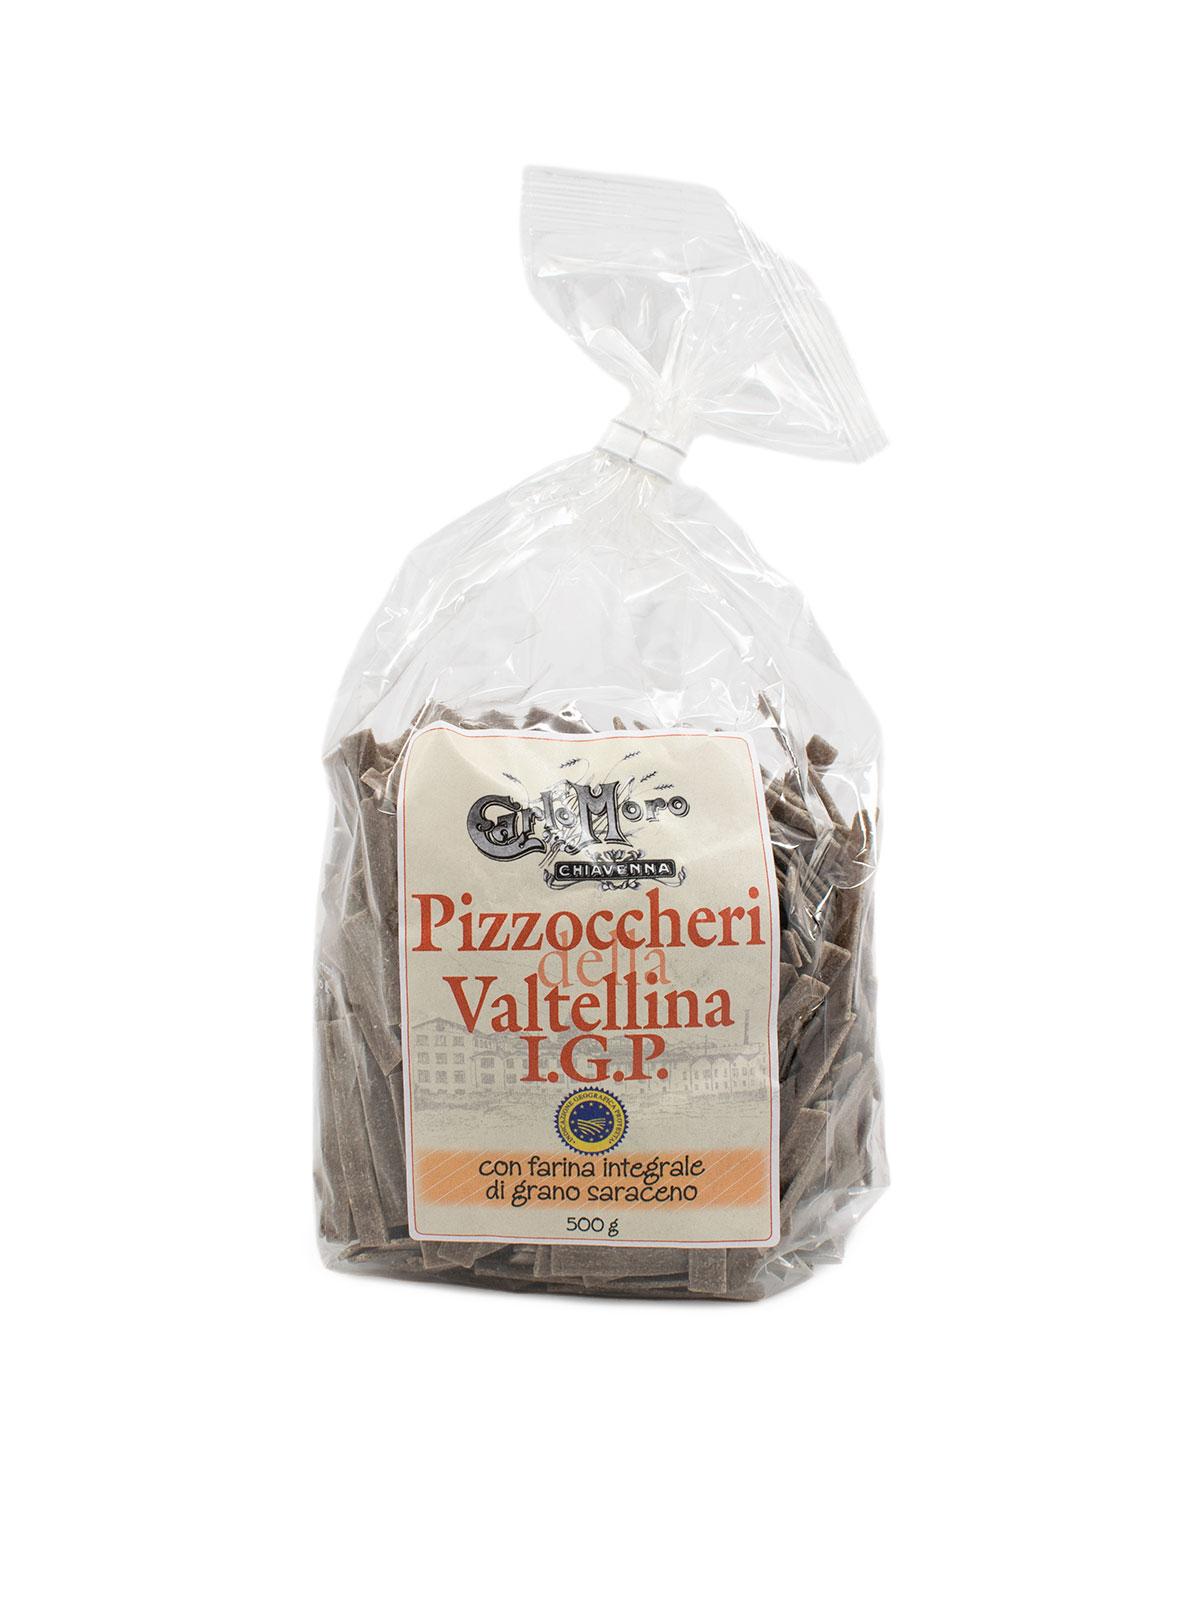 Buckwheat Pizzoccheri Della Valtellina- Pastas, Rice, and Grains - Buon'Italia